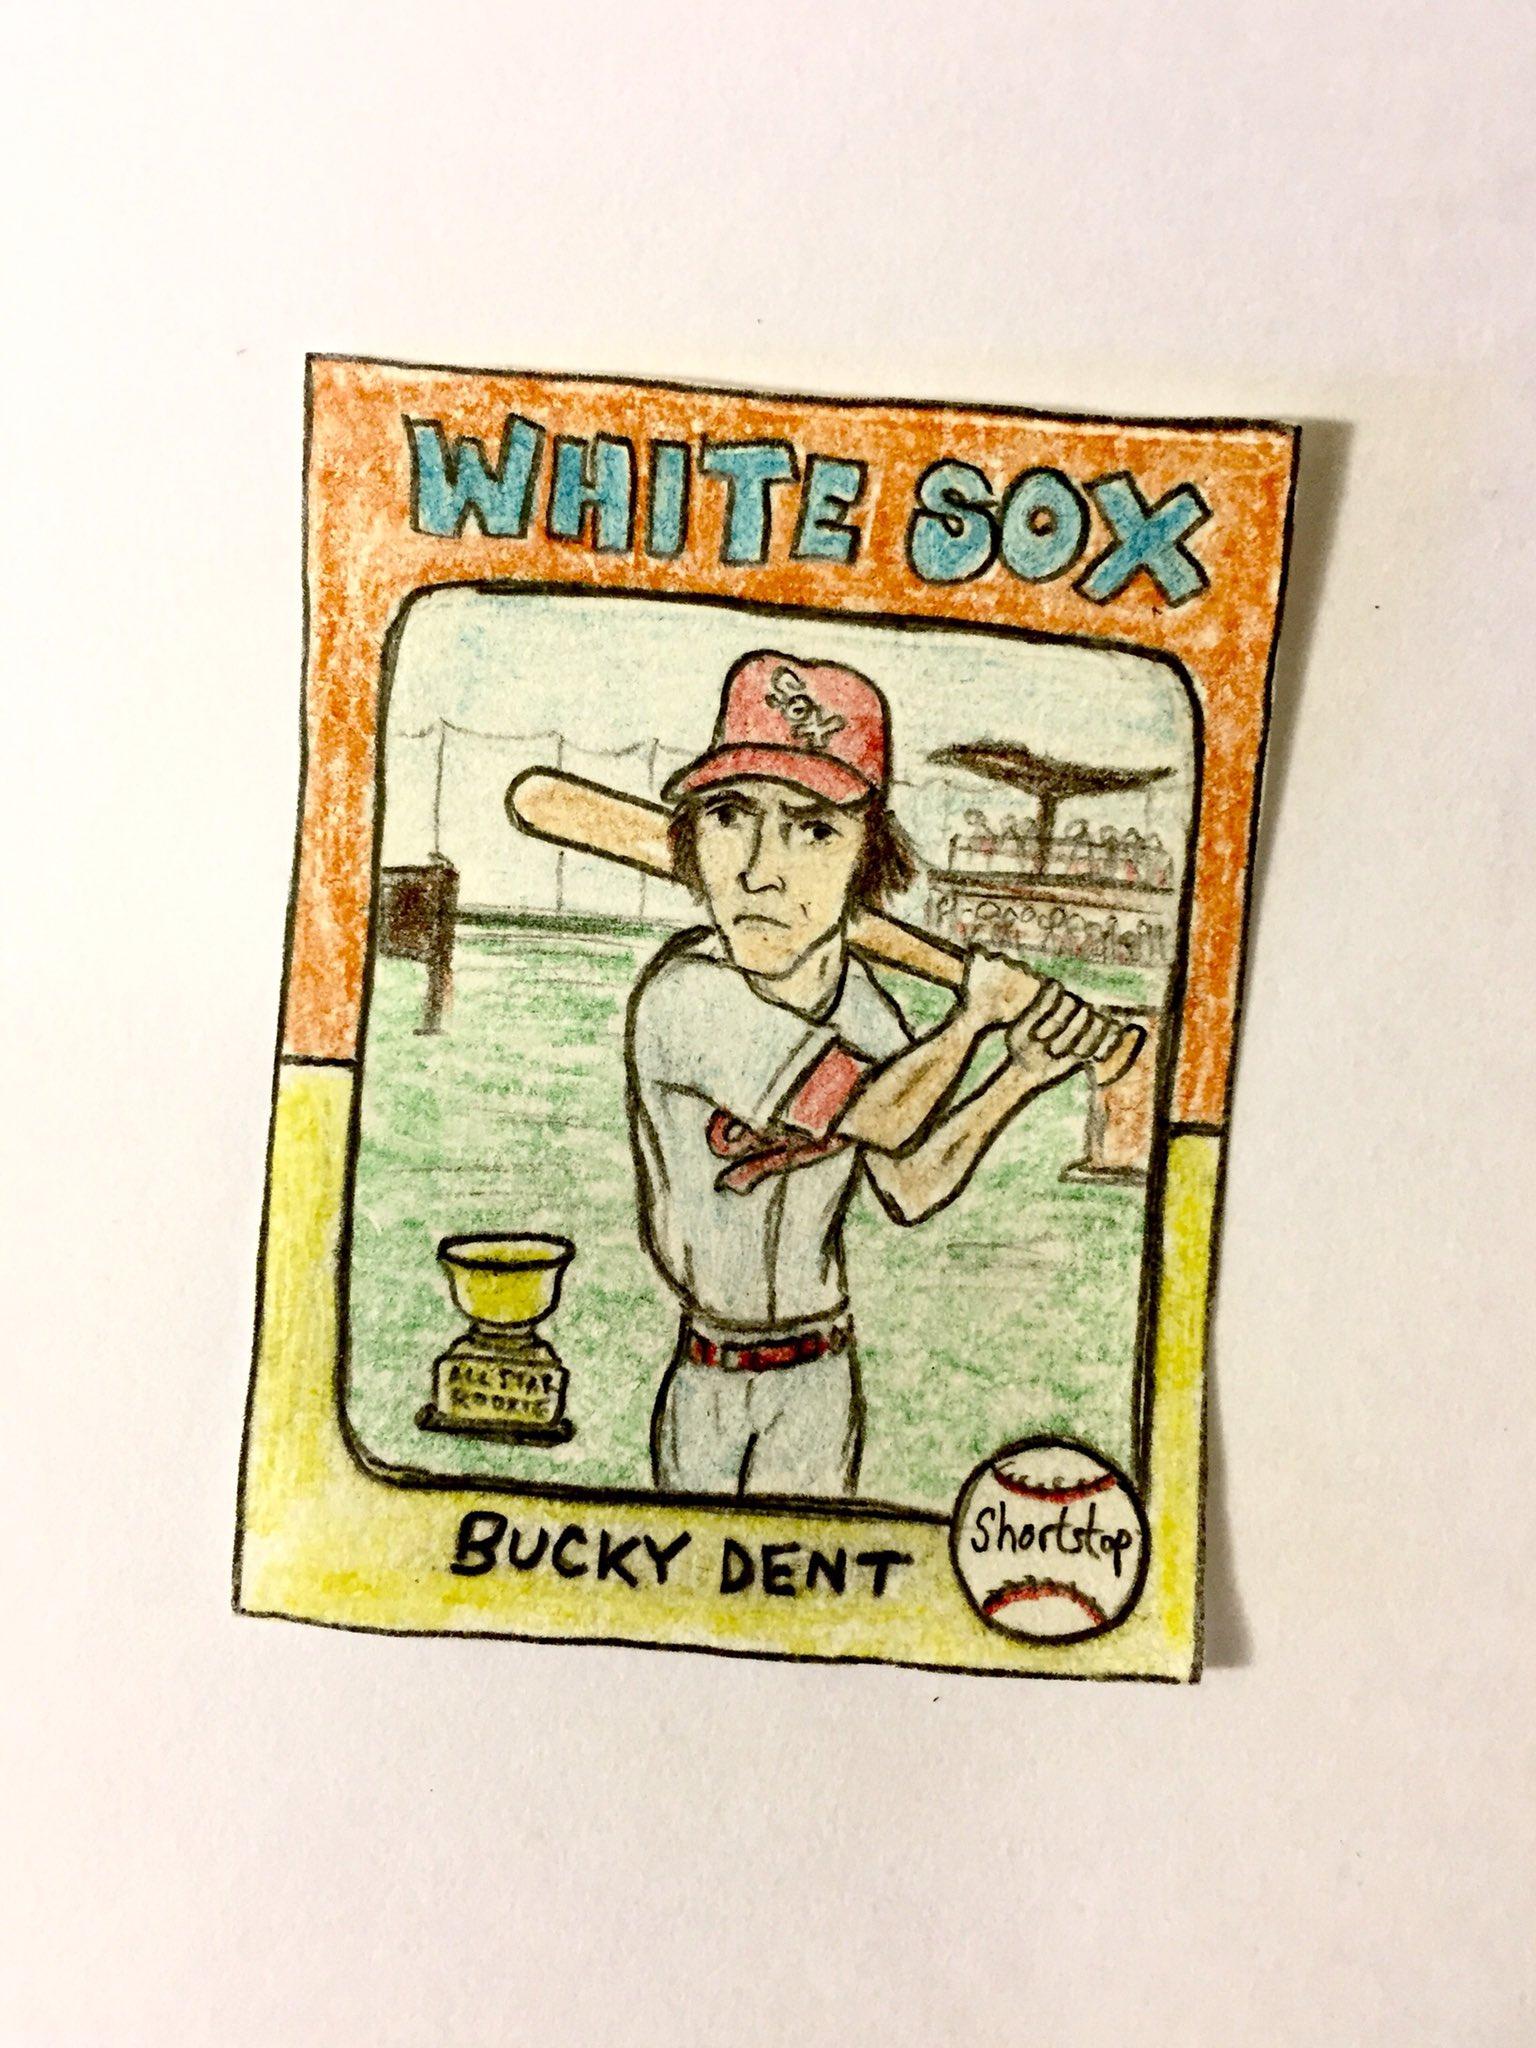 Wishing a happy 66th birthday to Bucky Dent!